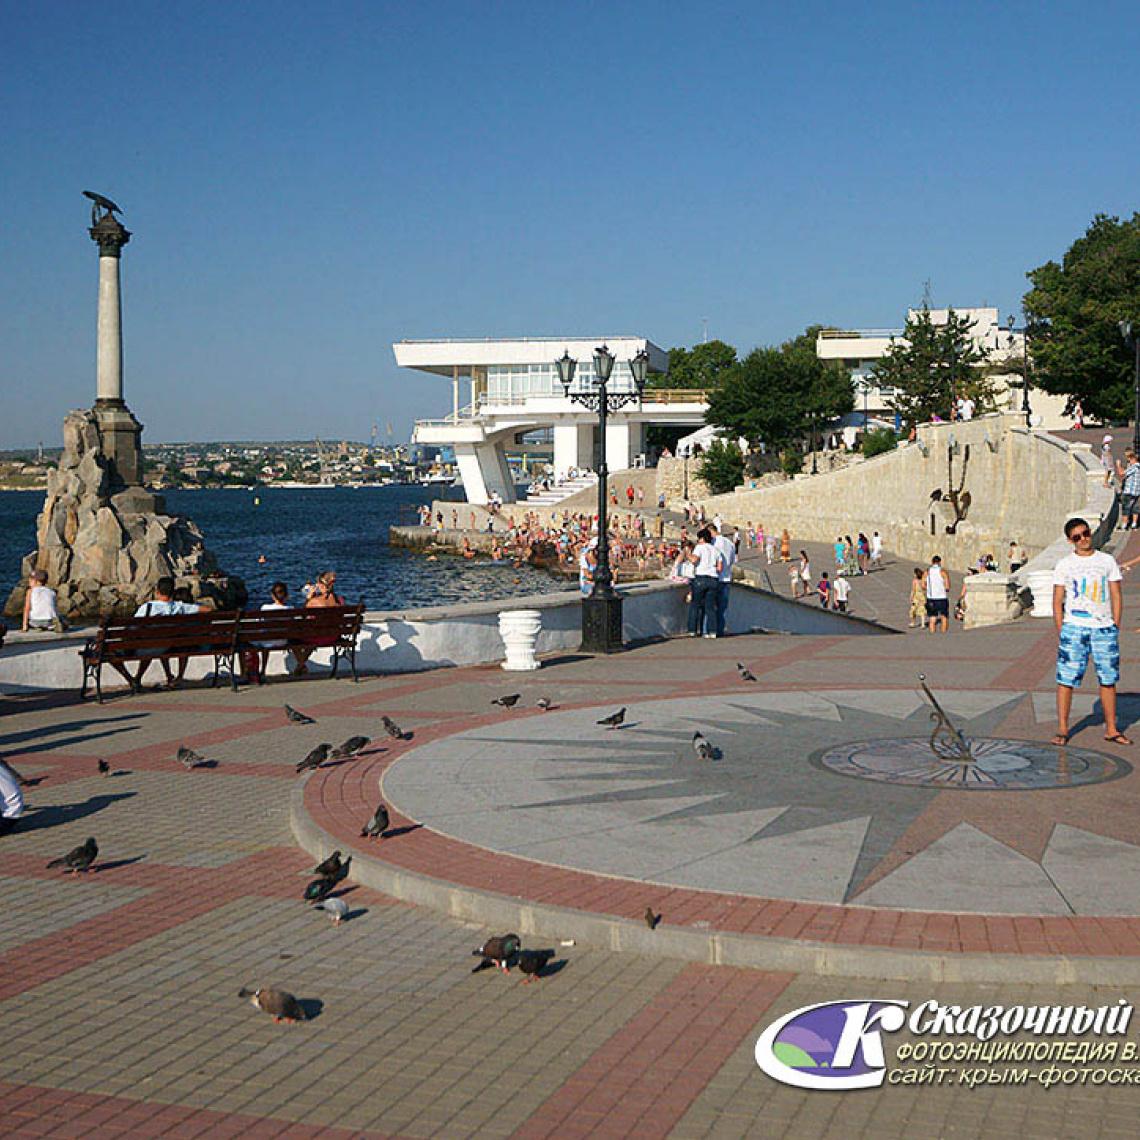 Севастополь, Балаклава, Инкерман из Николаевки